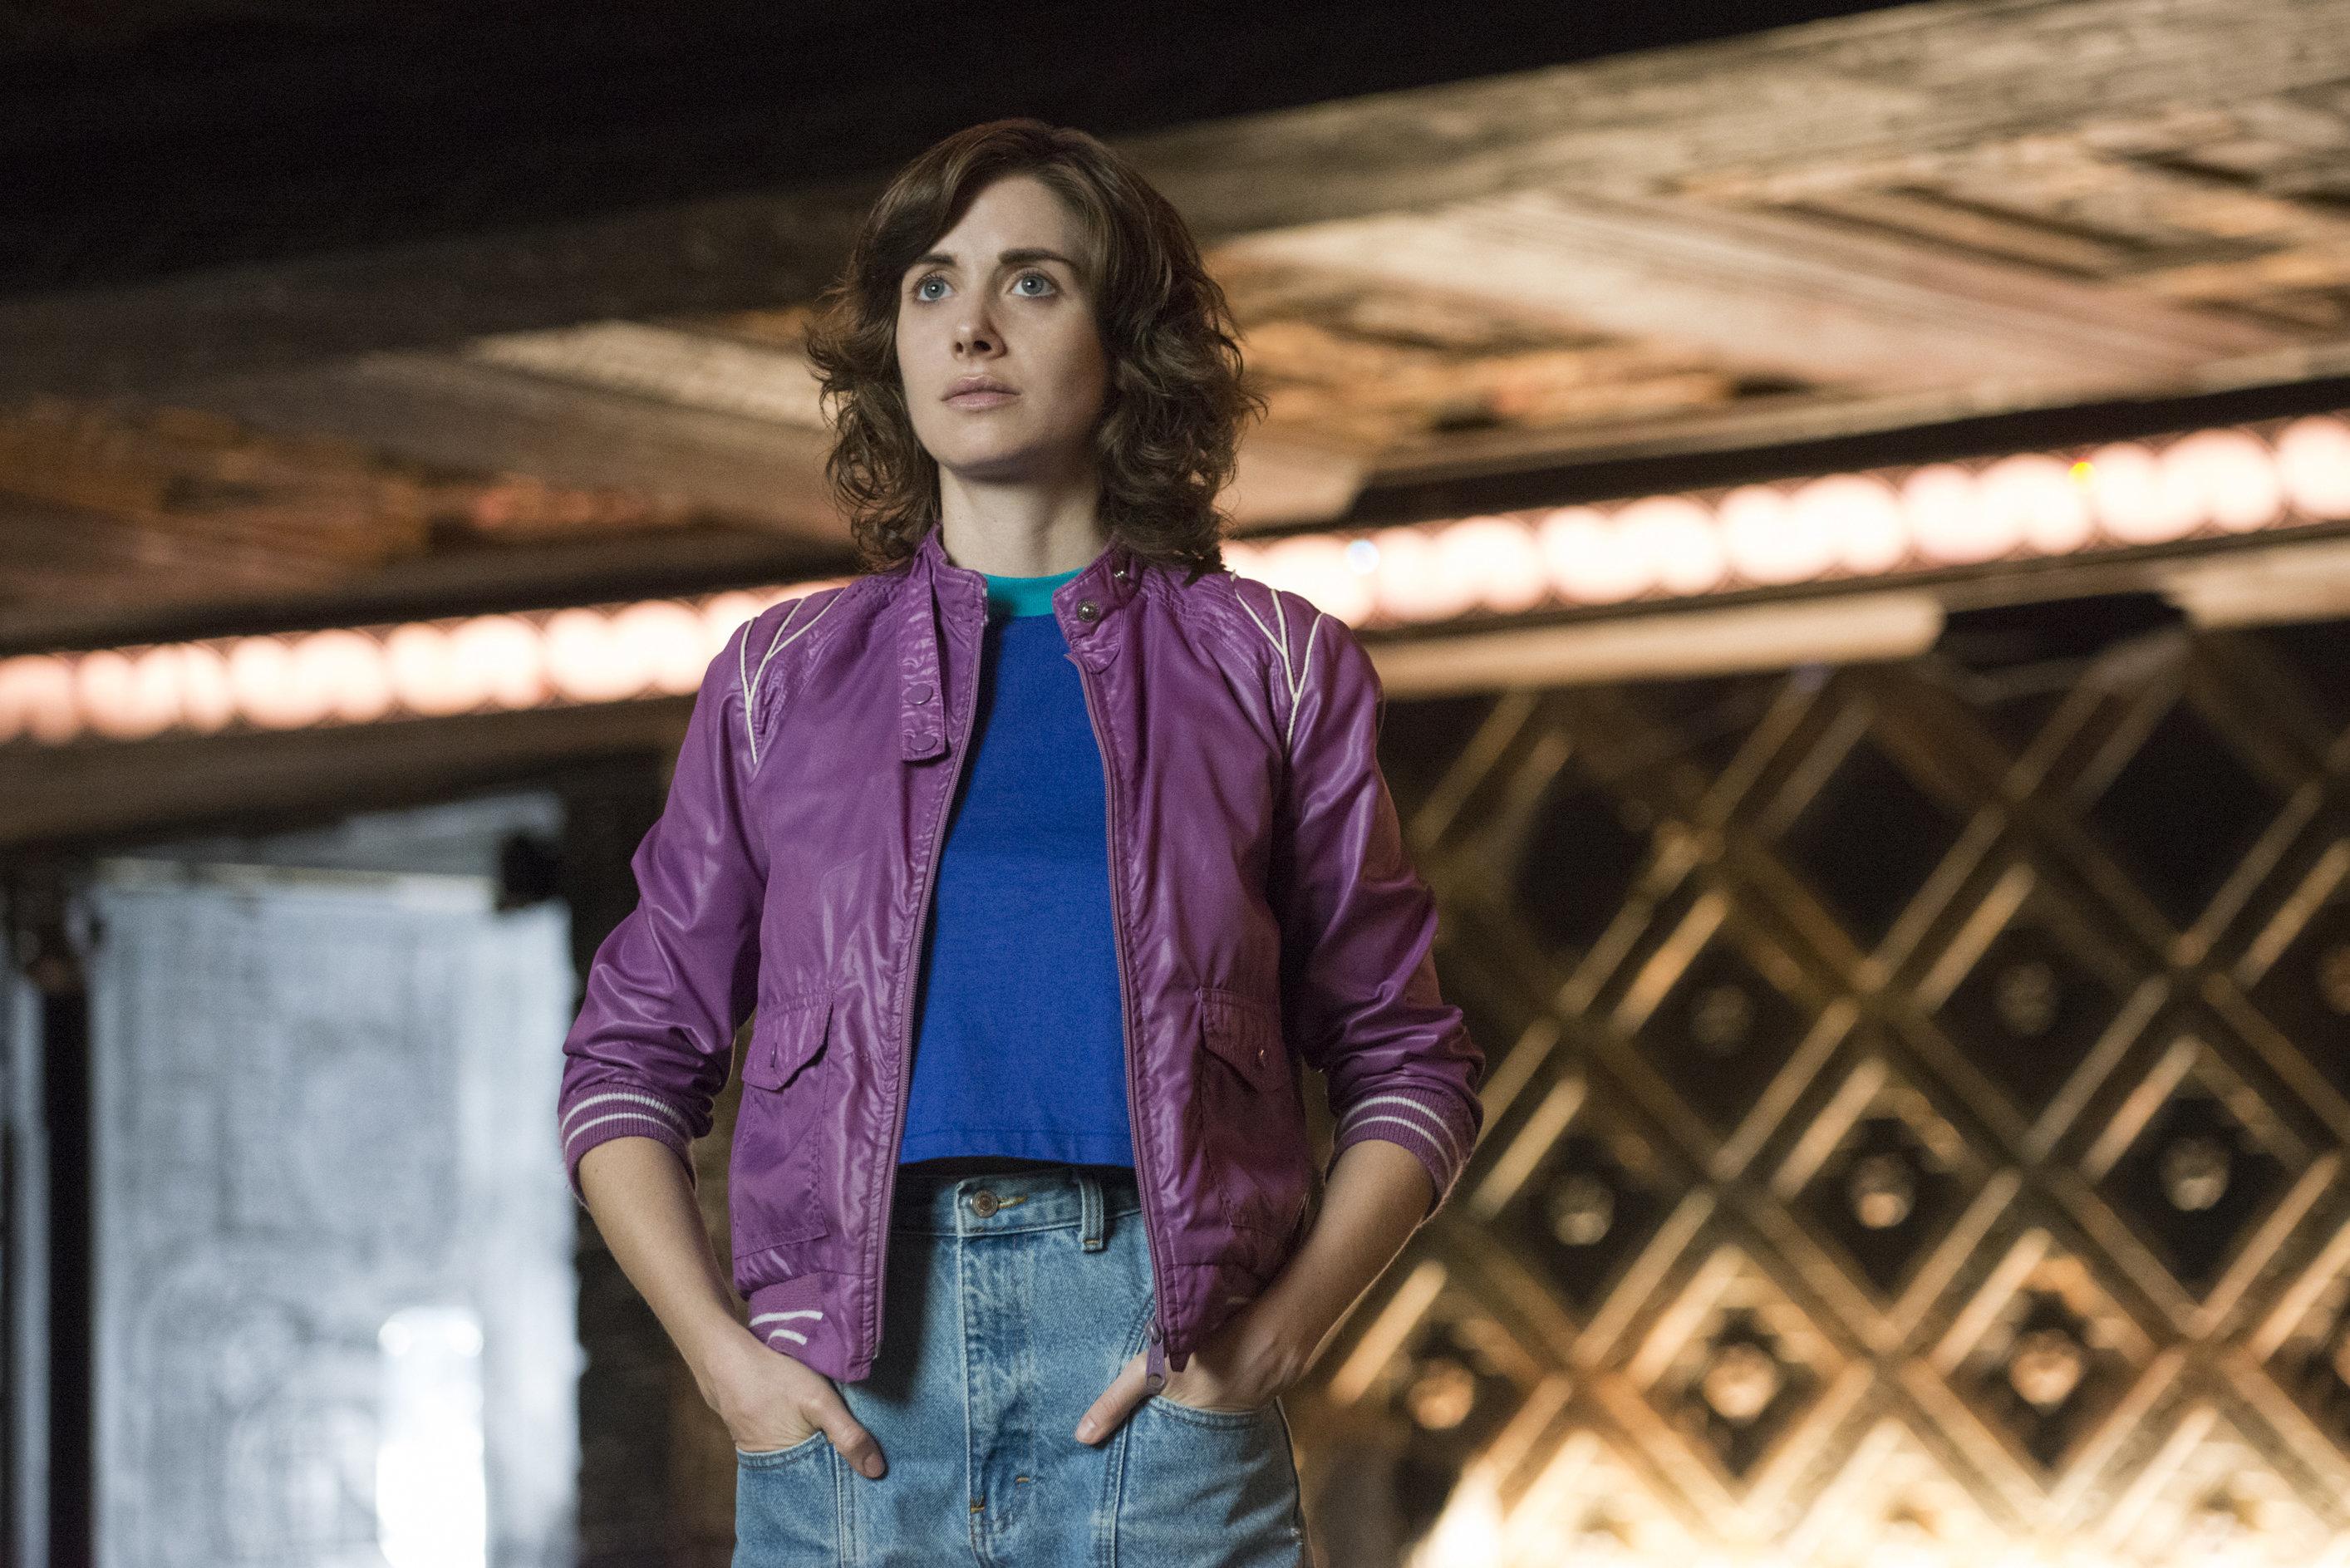 Netflix's 'GLOW' Trailer Is An '80s Wrestling-Filled